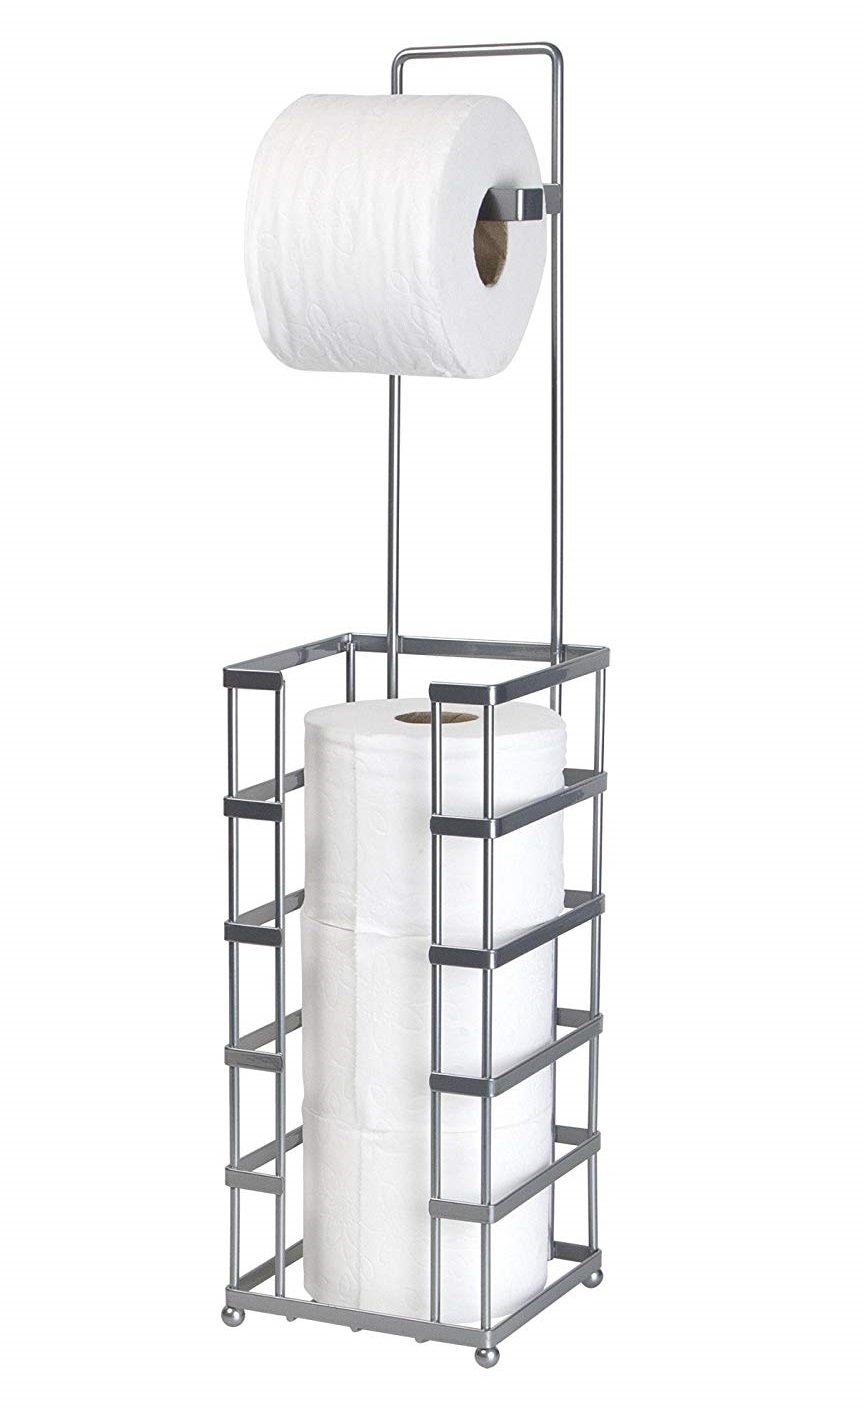 Toilet Paper Storage Reserve - Free Standing - Modern Bathroom Space Saver - Holds 3 Standard Rolls – Satin Nickel -Richards Homewares RI-20049052